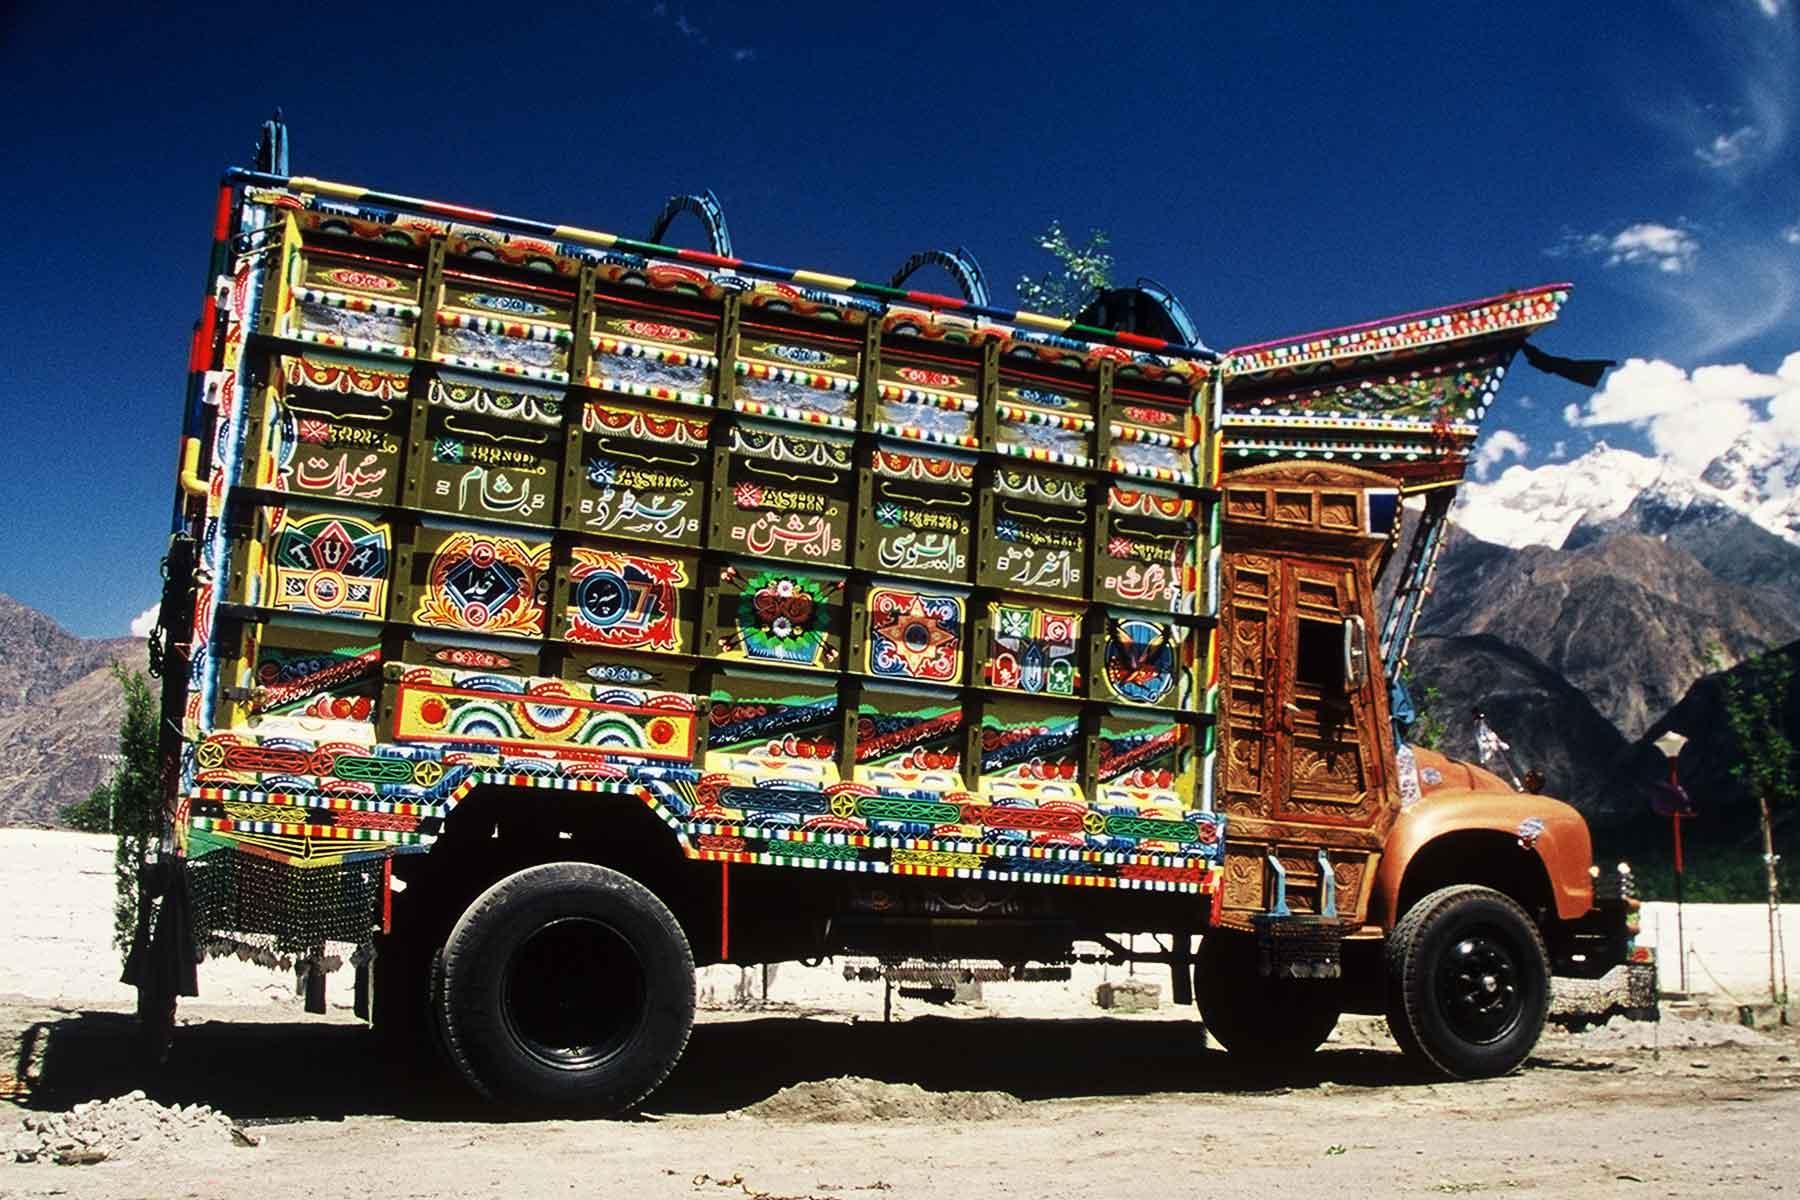 Colorful Bedford Pakistani Truck - Pakistan Photo Journal - Steven Andrew Martin - Karakoram Highway - Silk Road